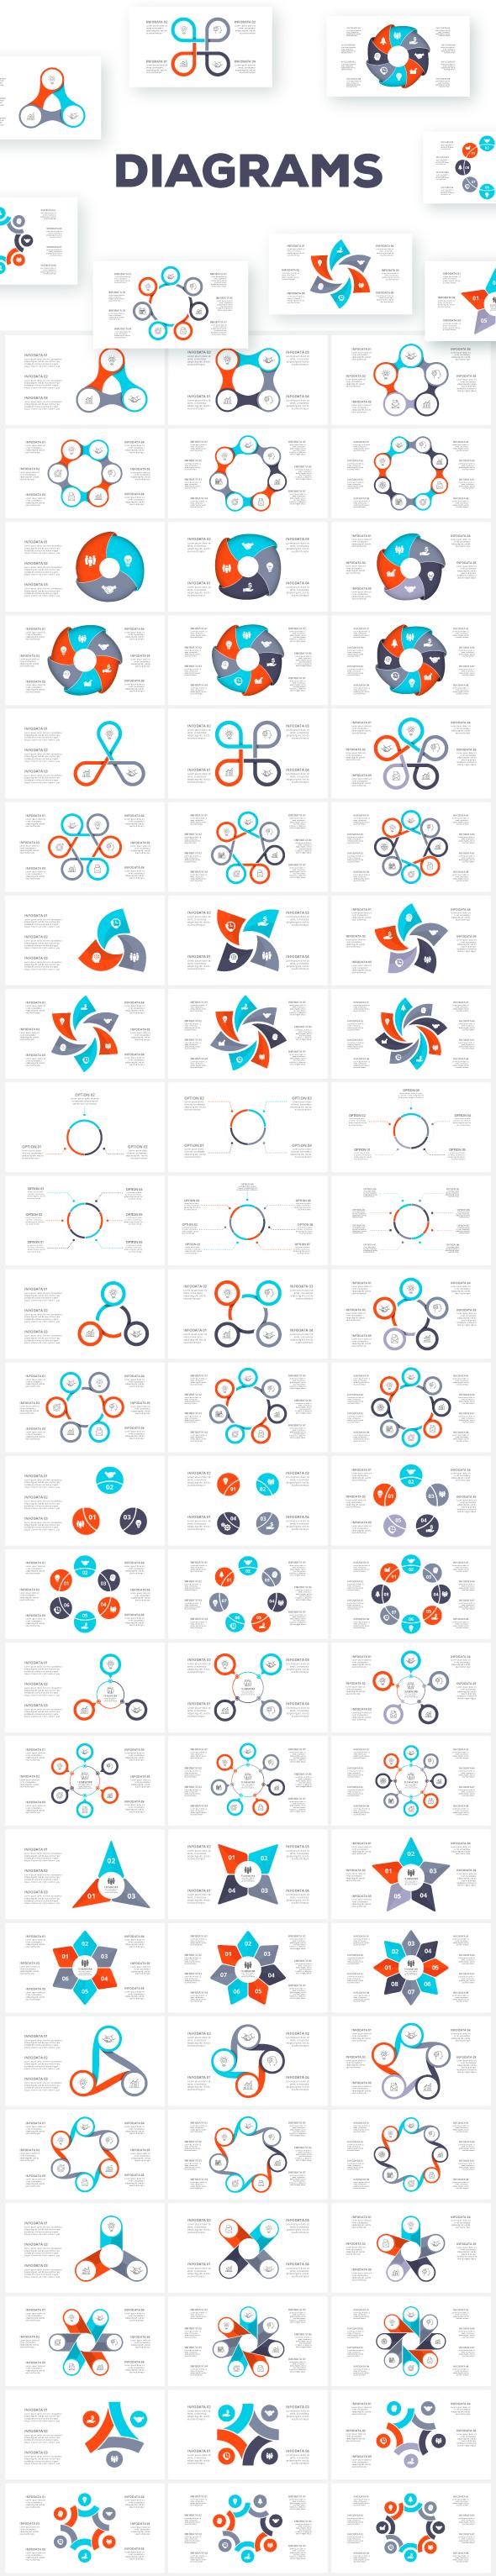 Multipurpose Infographics PowerPoint Templates v.5.0 - 137